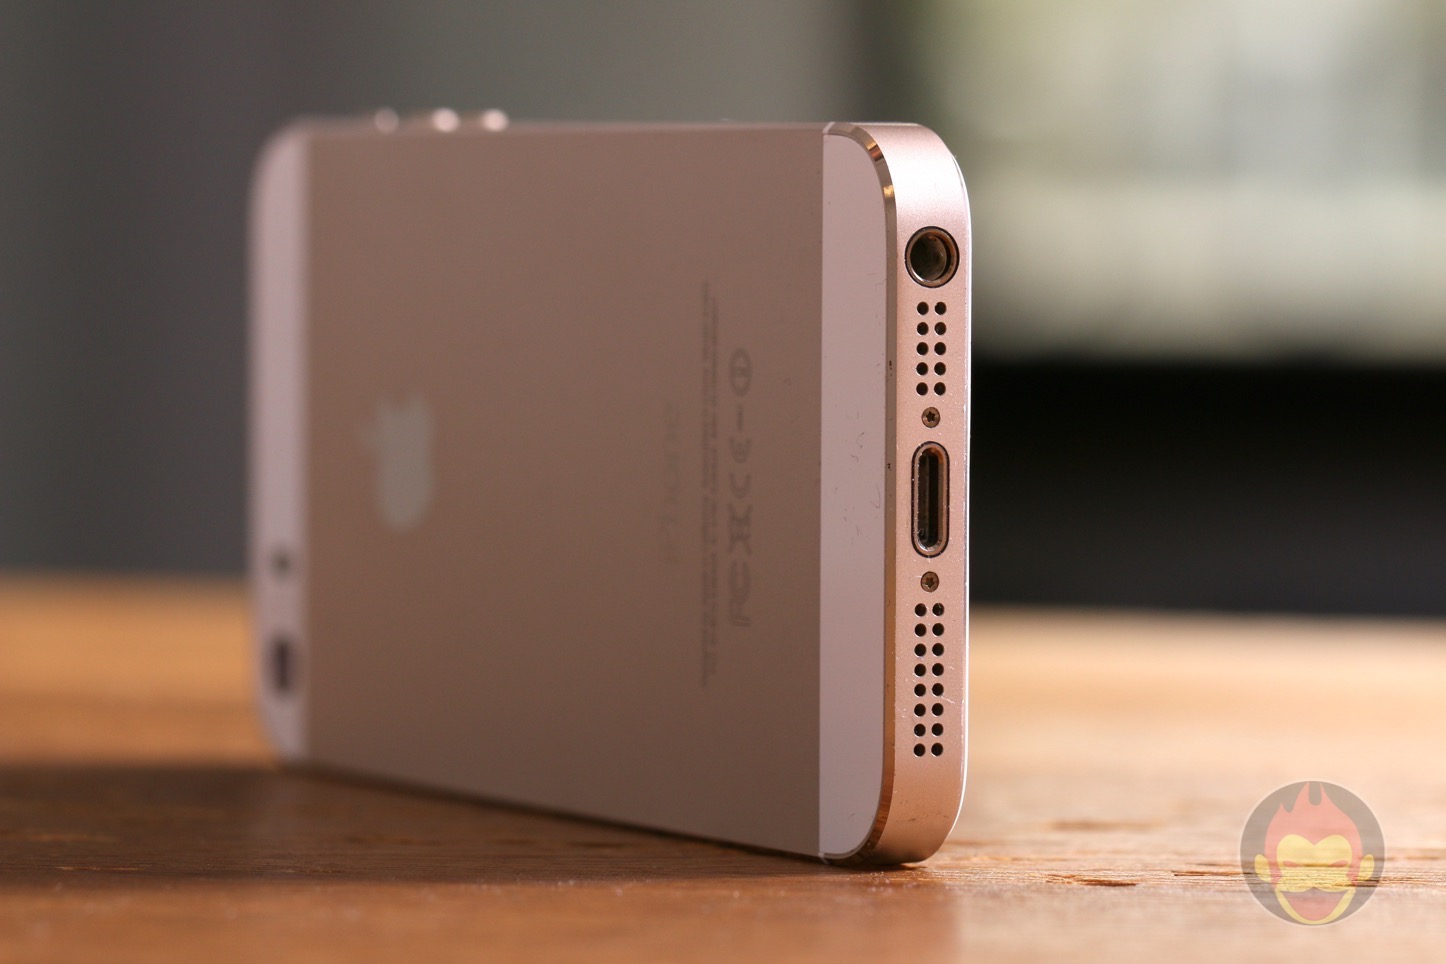 iPhone-5s-Photo-Table-01.JPG